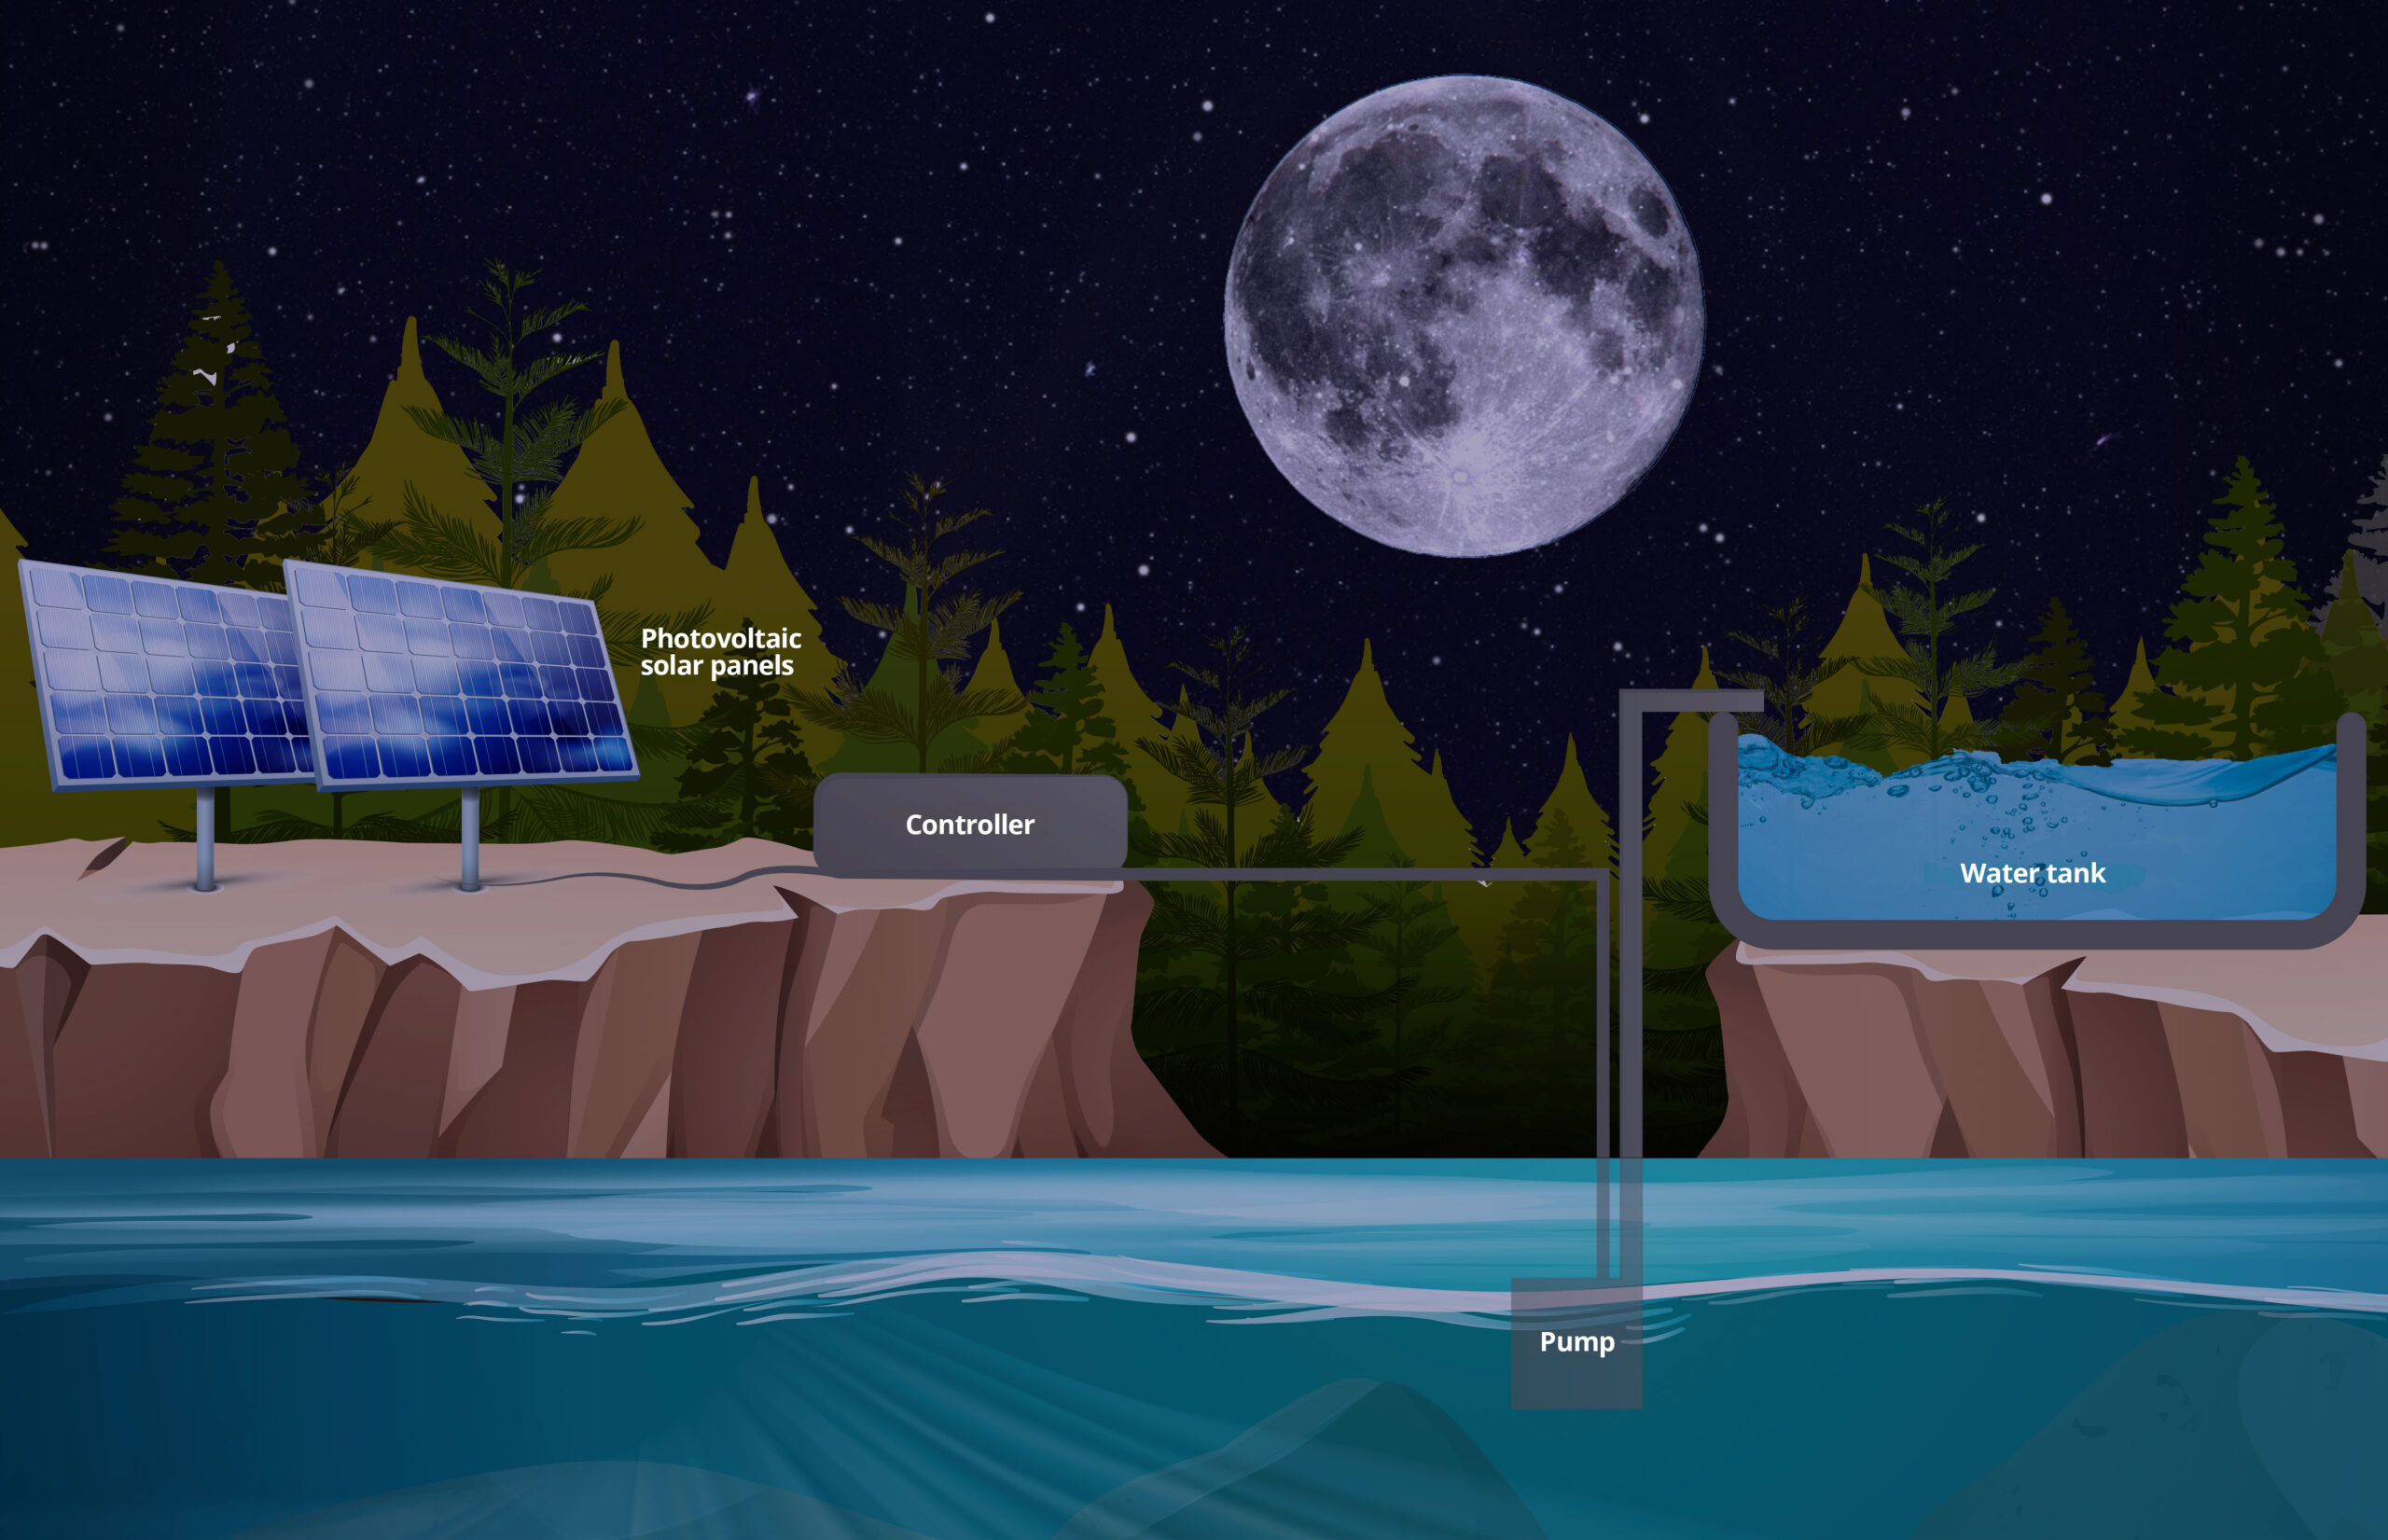 Pumping systems scheme night